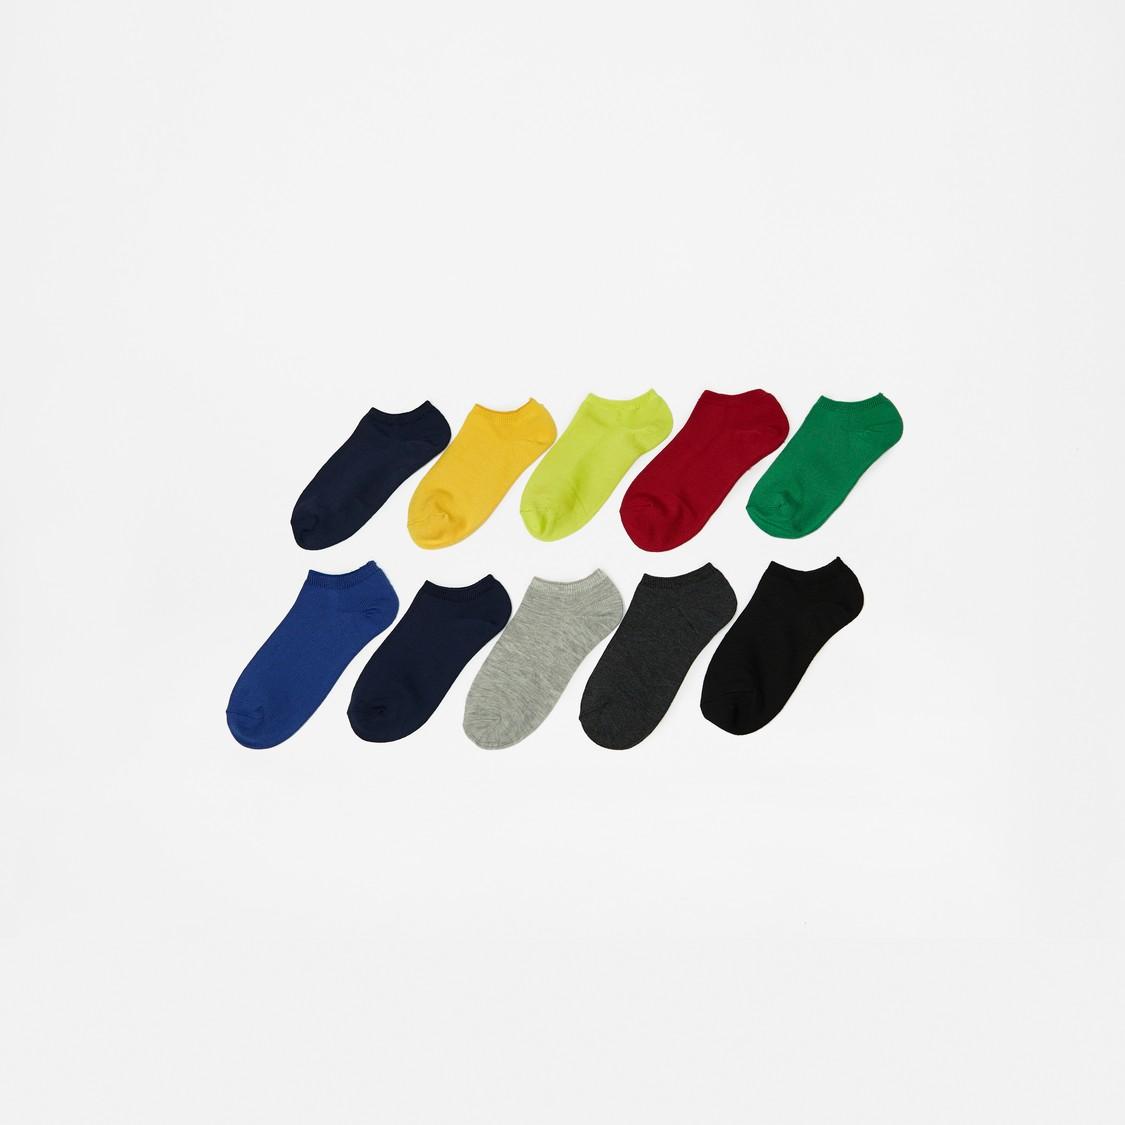 Ribbed Ankle Length Socks - Set of 10